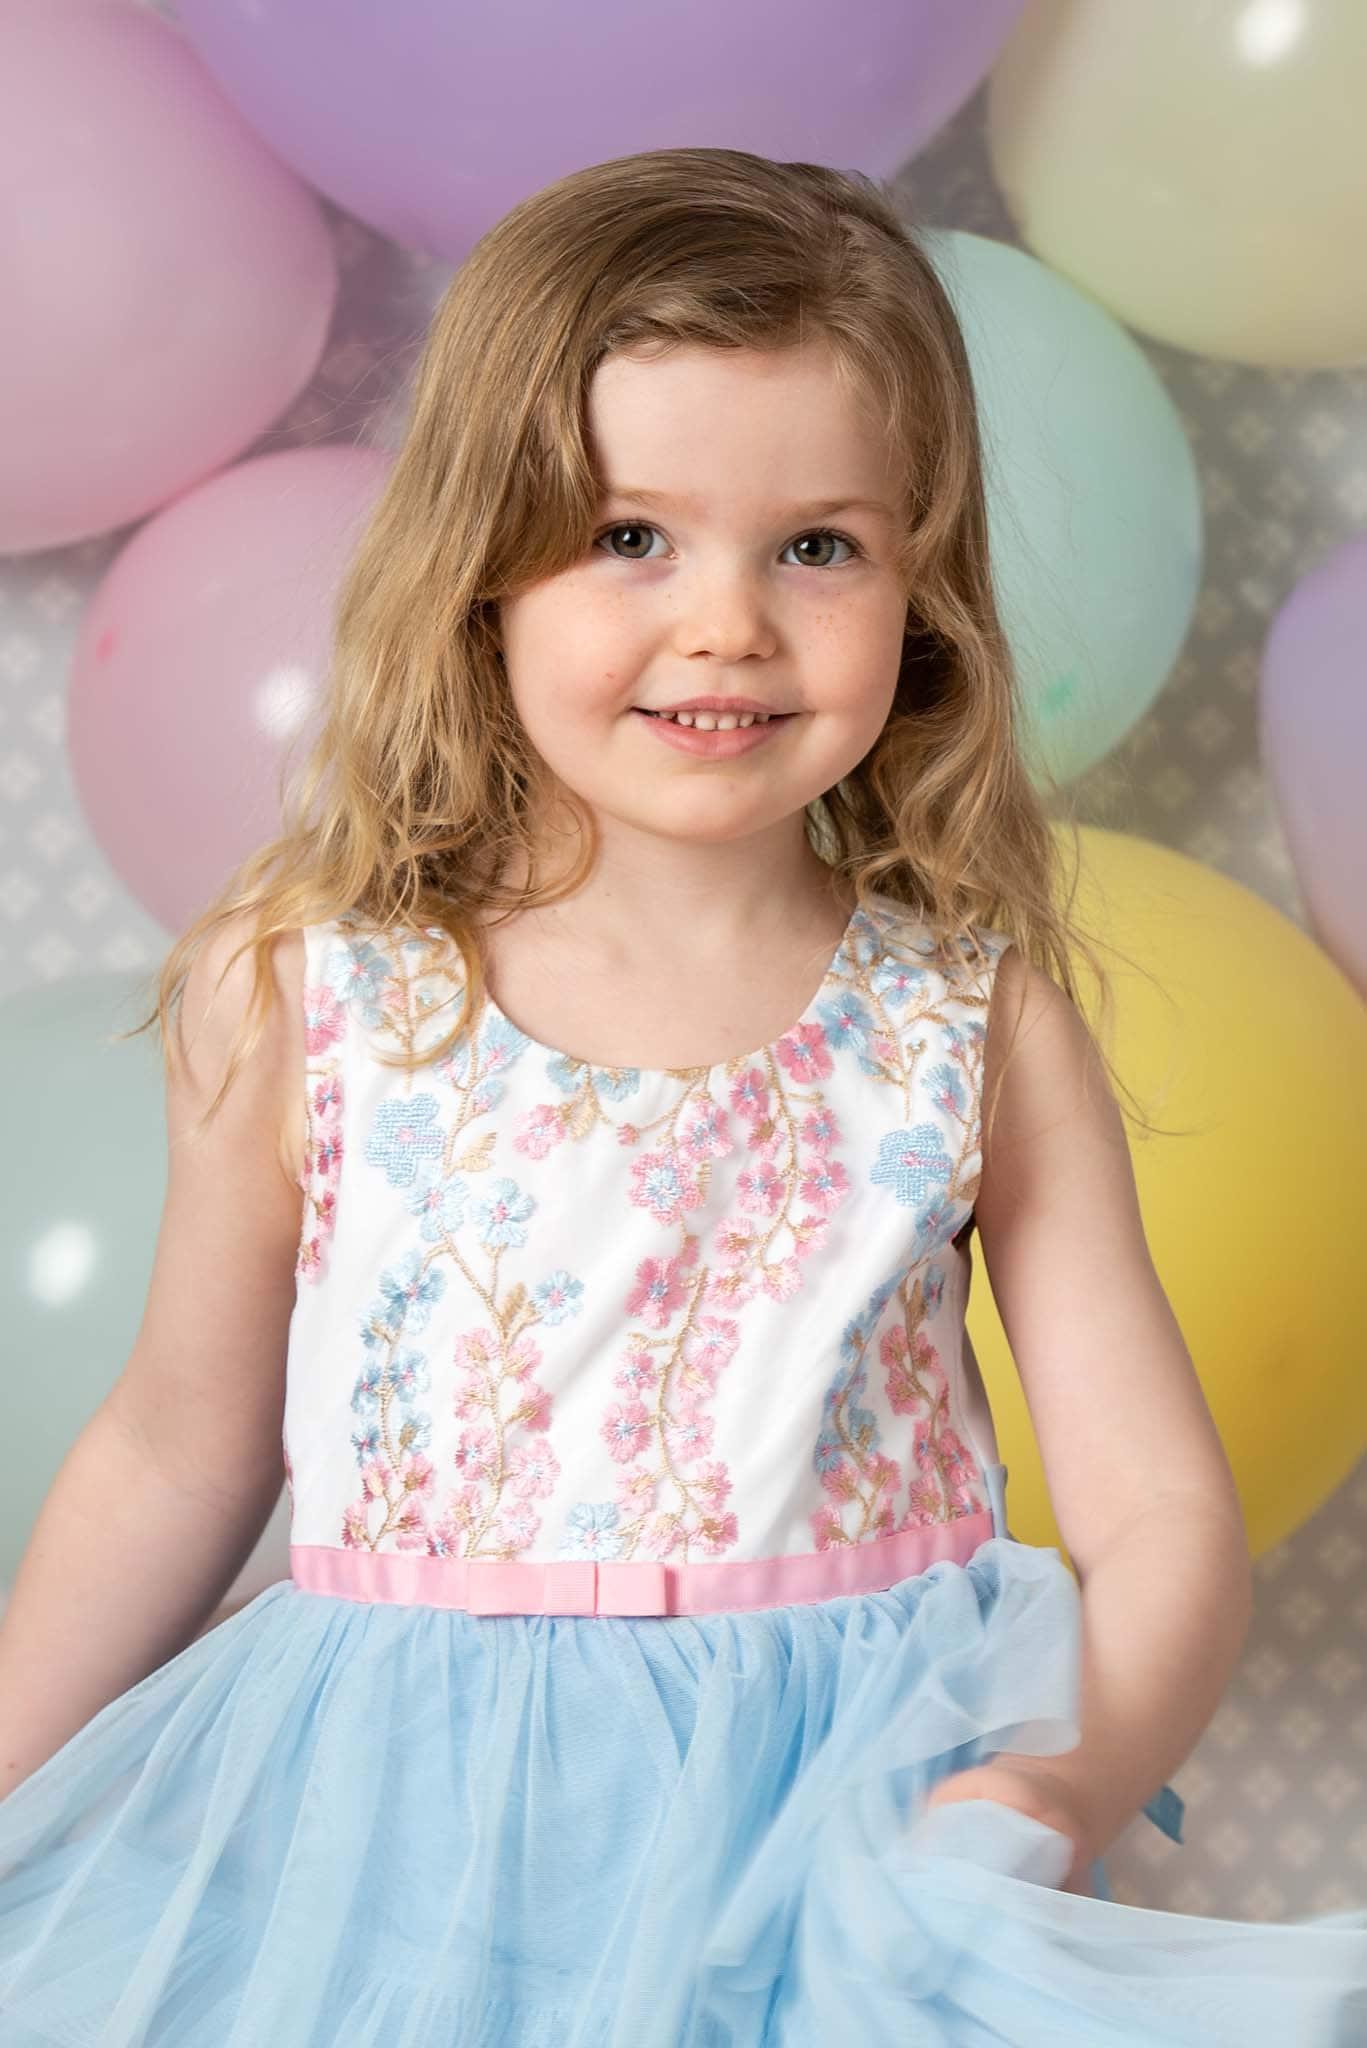 Studiofoto barn 5 år